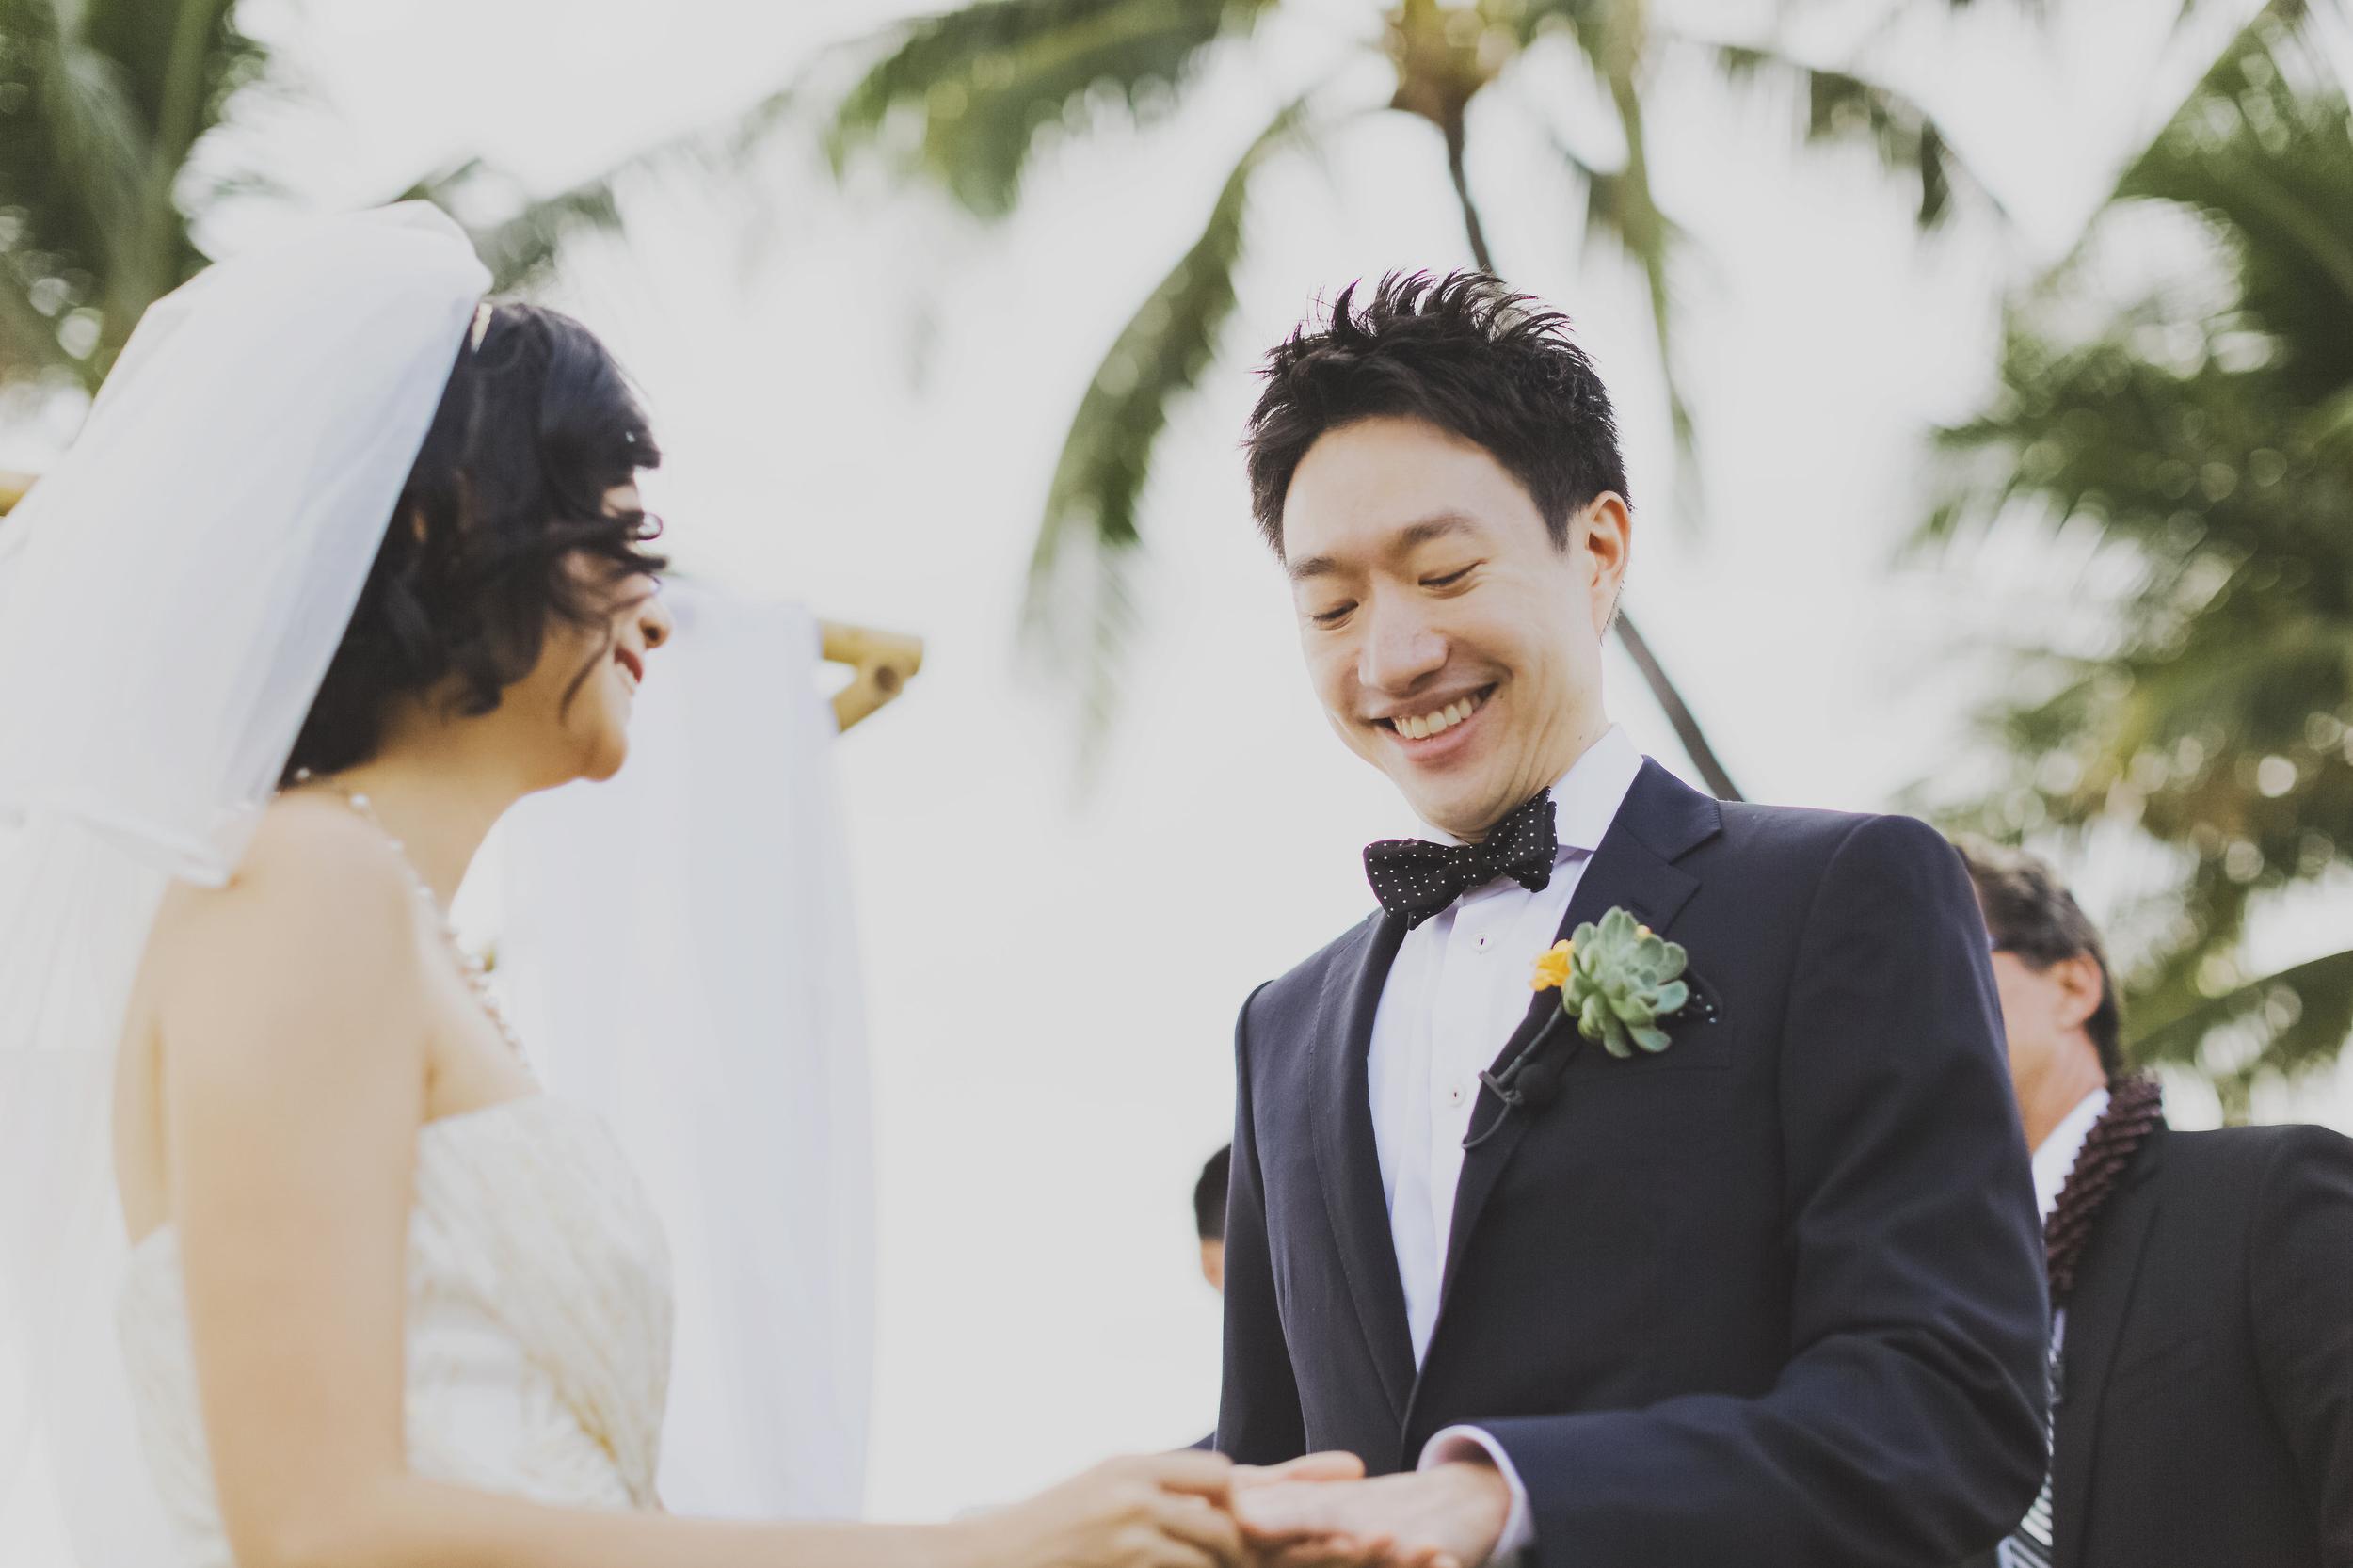 angie-diaz-photography-oahu-wedding-lanikuhonoa-shenshen-marshall-33.jpg